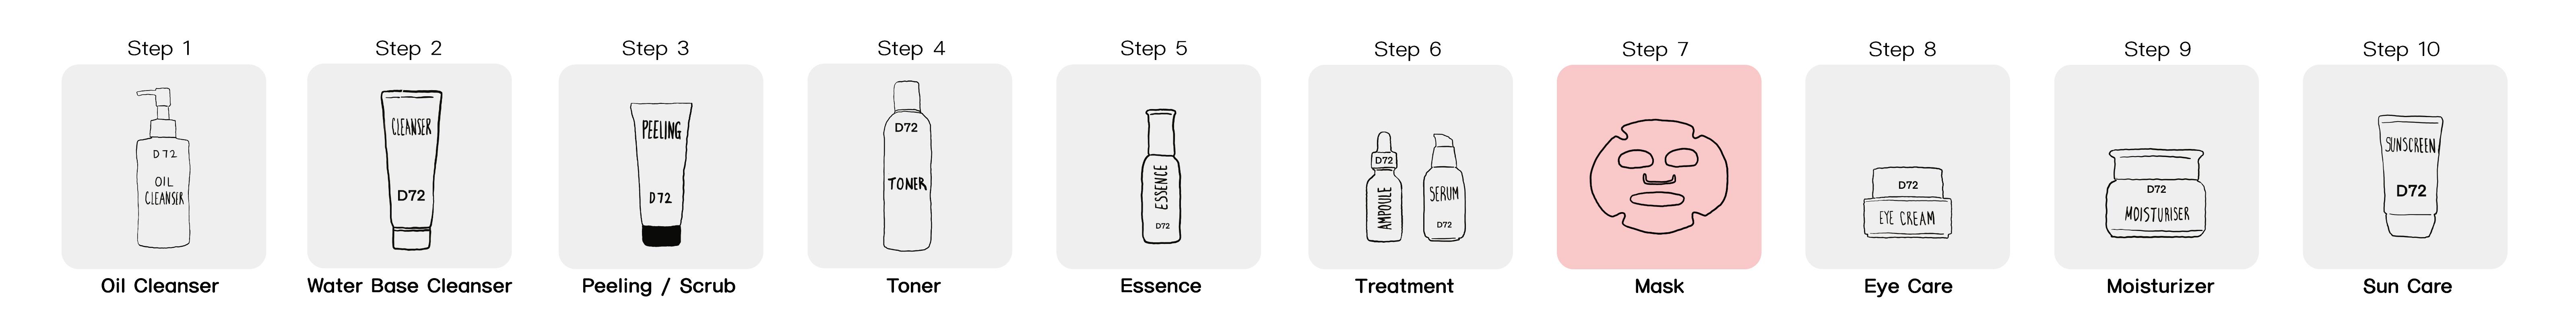 step7-mask.jpg